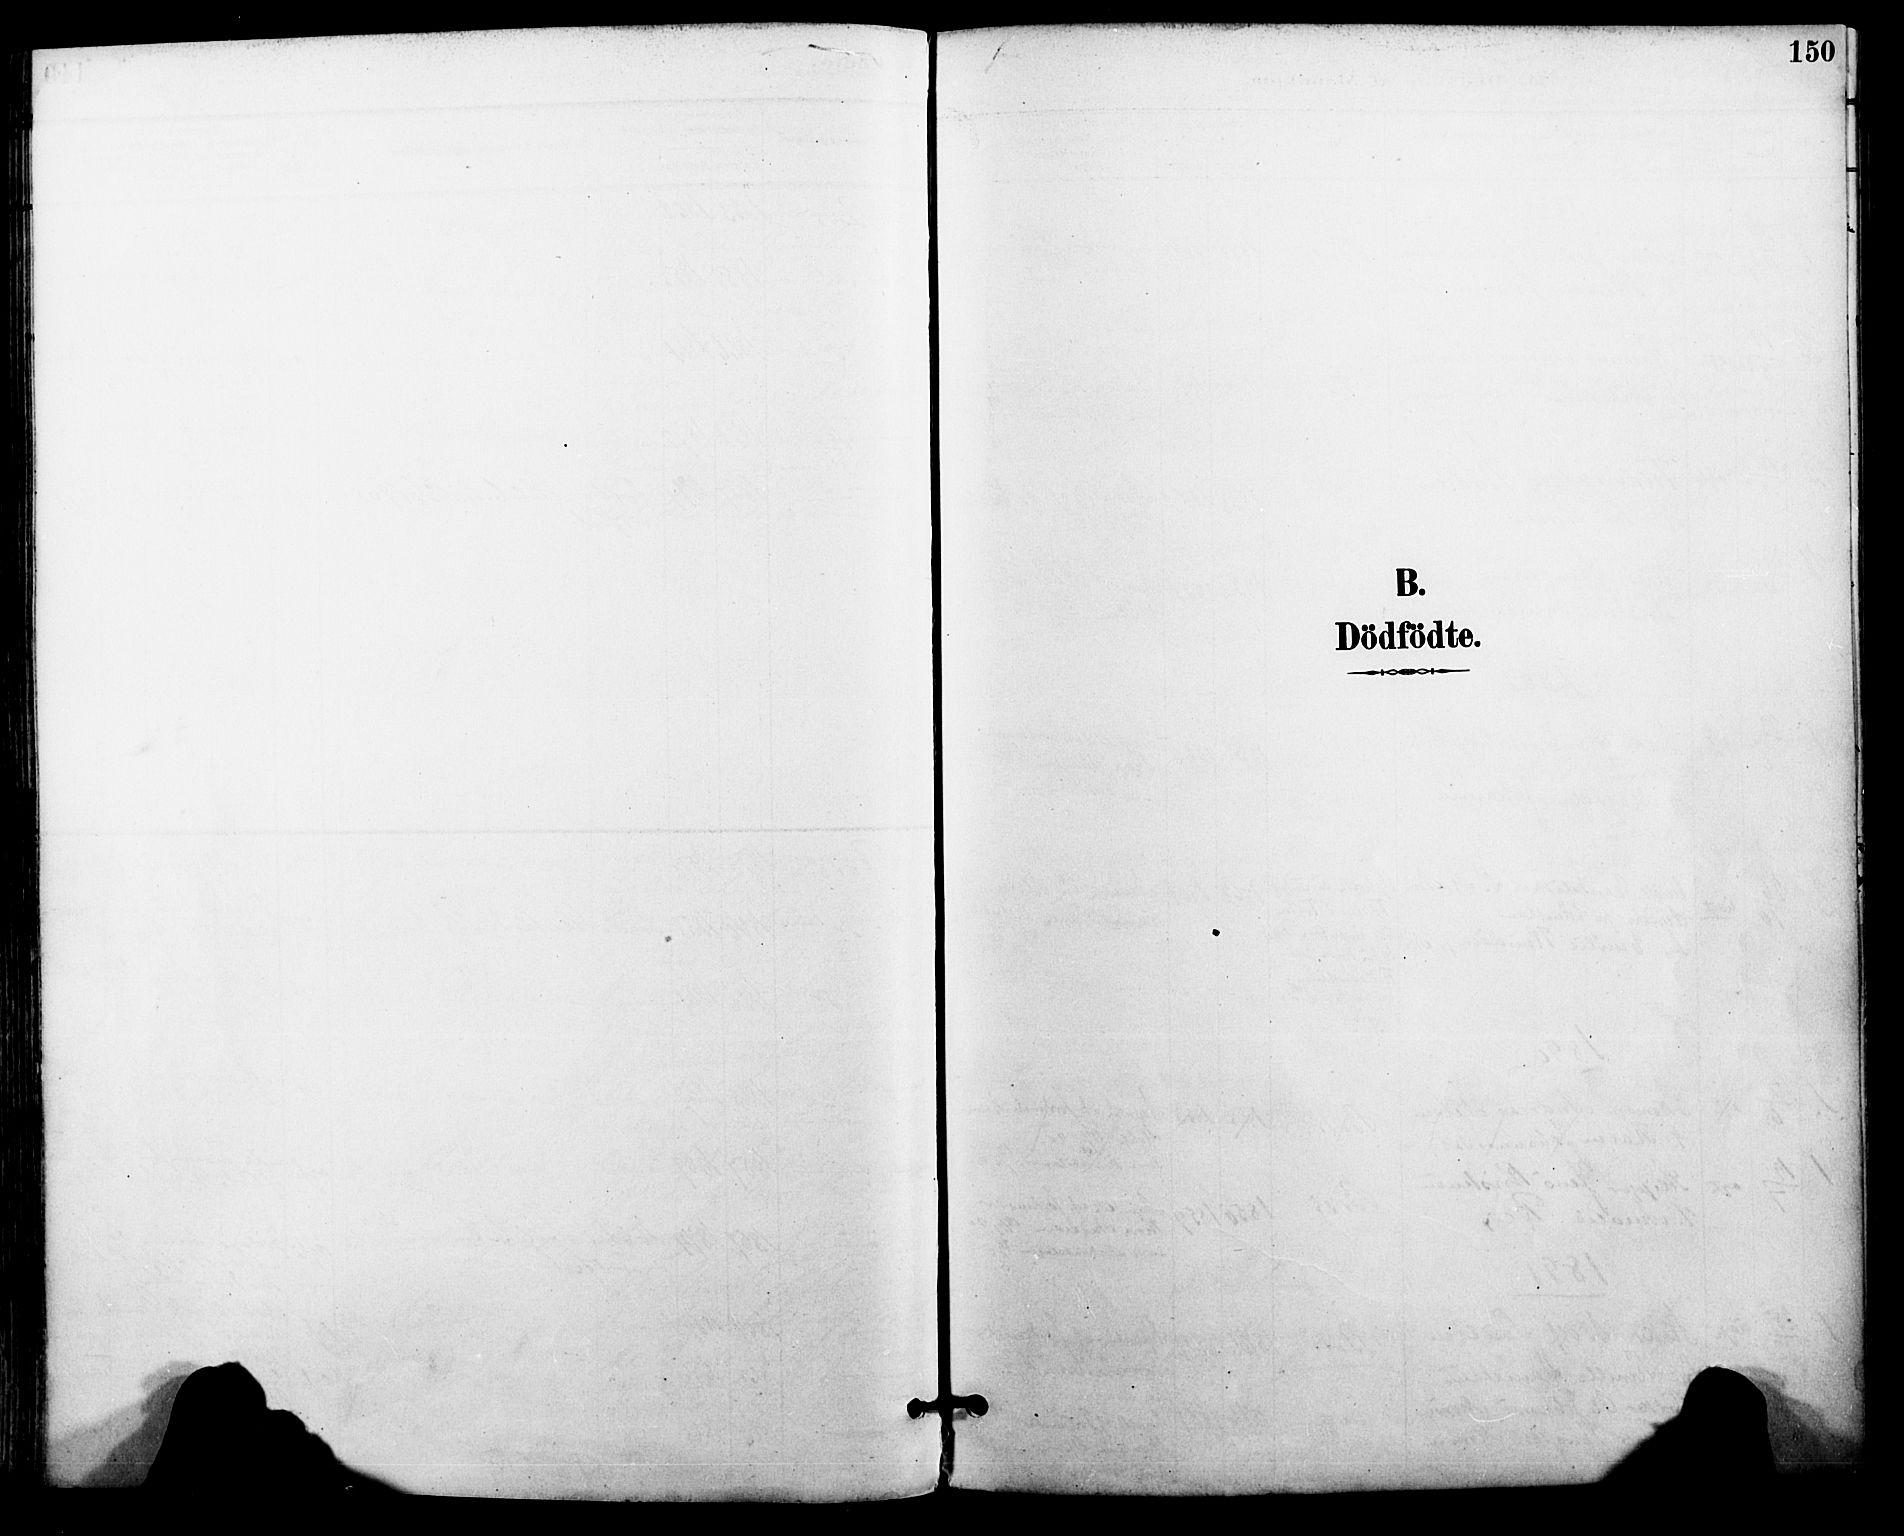 SAT, Ministerialprotokoller, klokkerbøker og fødselsregistre - Nordland, 801/L0010: Ministerialbok nr. 801A10, 1888-1899, s. 150